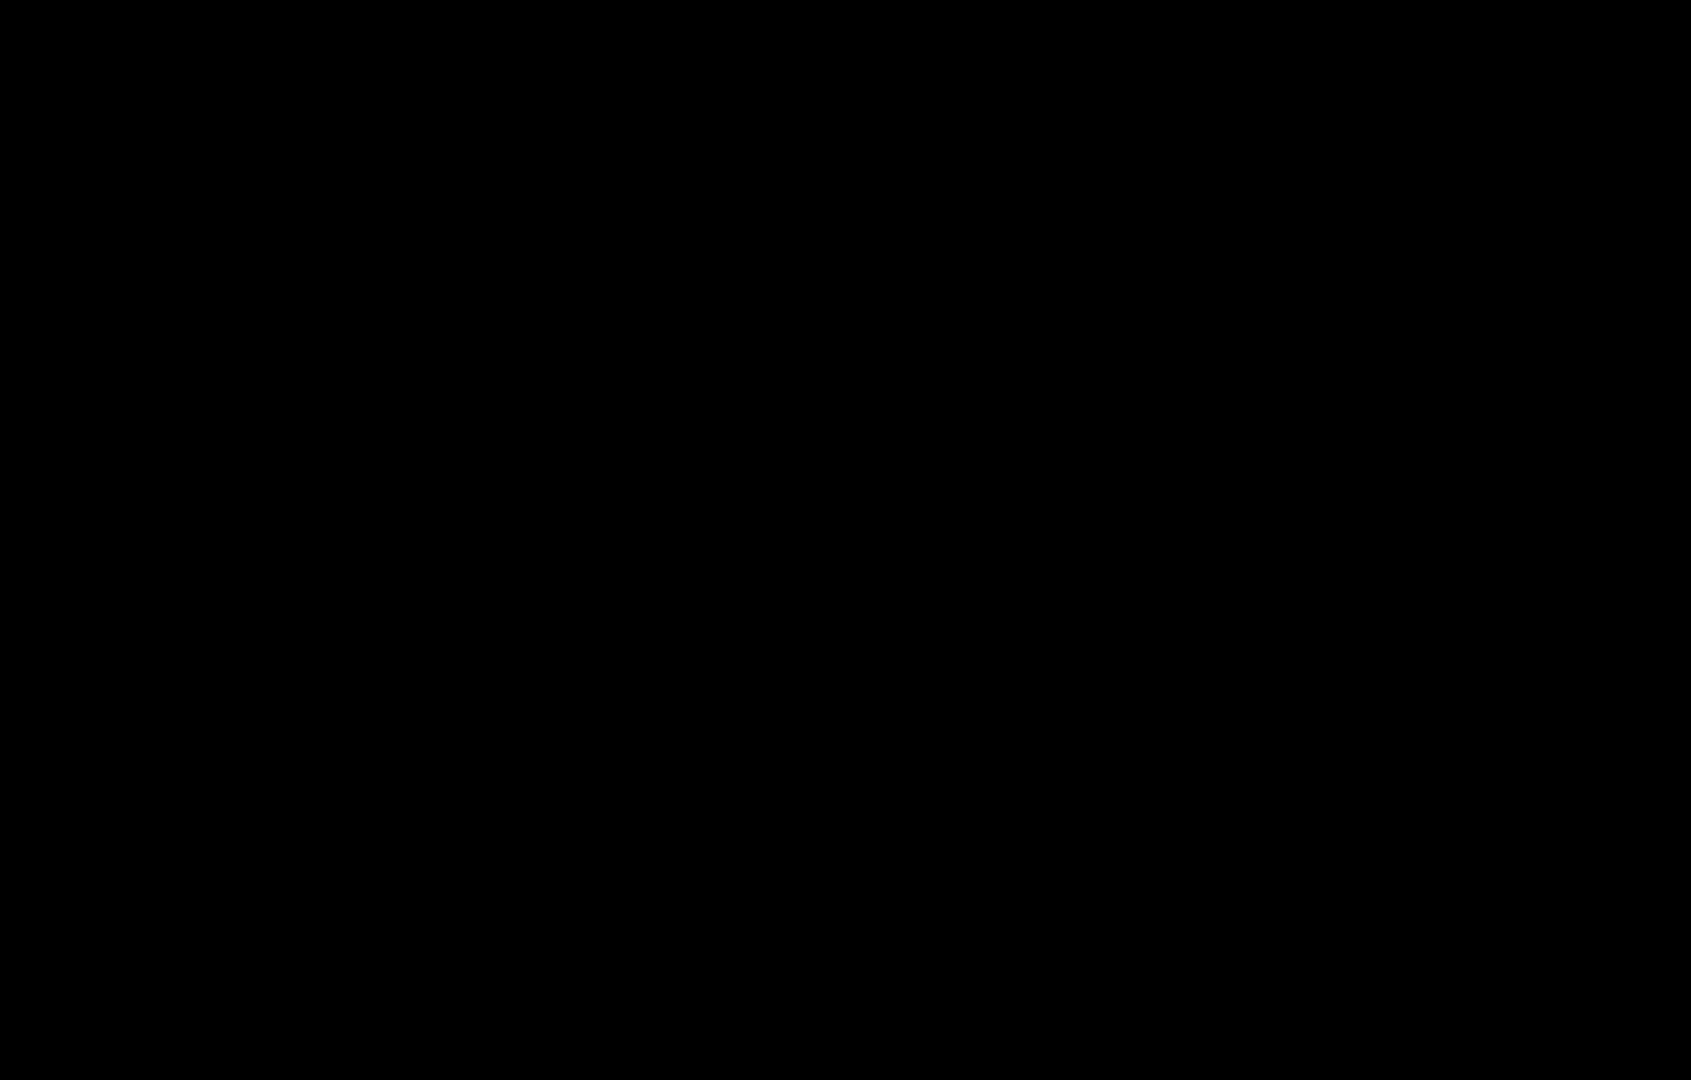 Equipotel Marca 2019